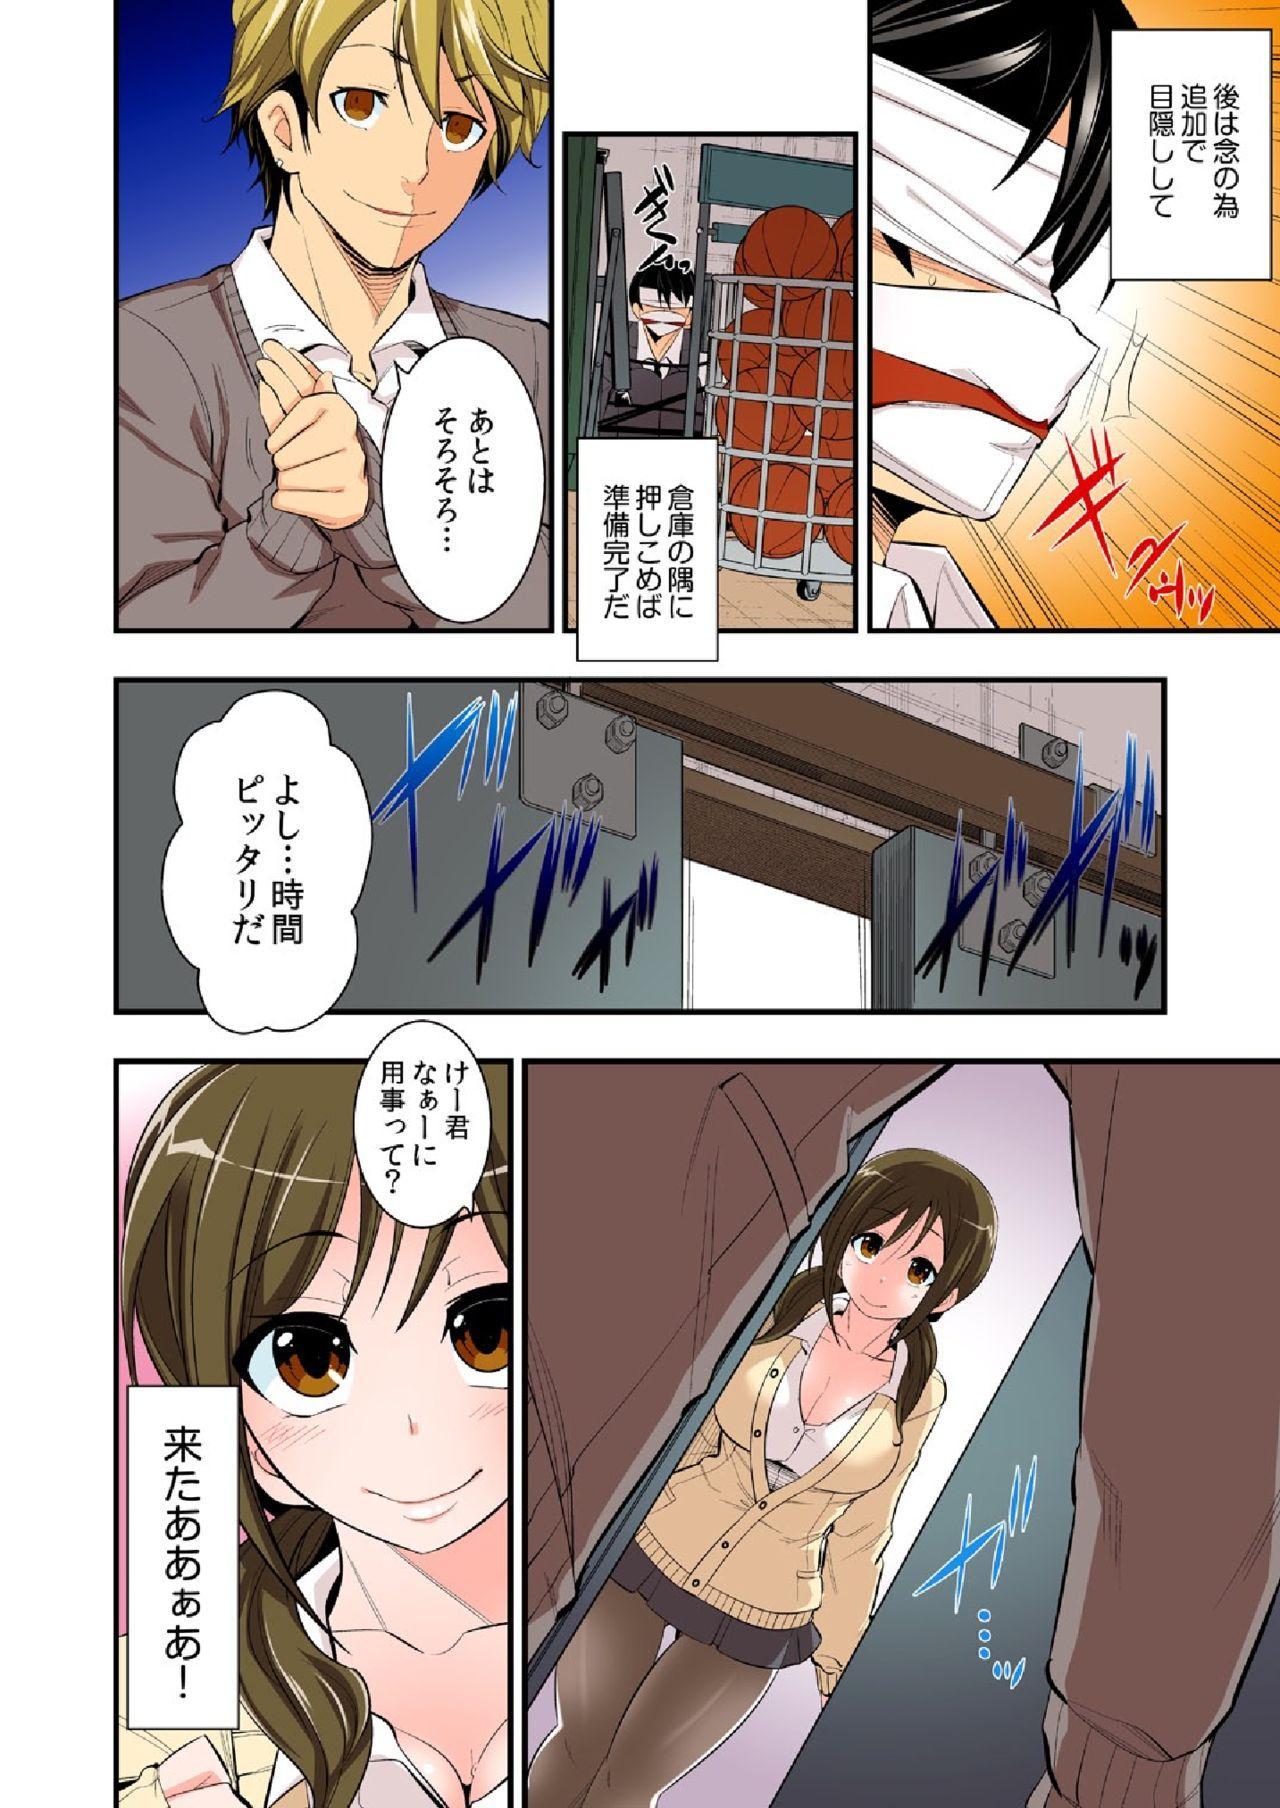 Dakimakura ni Natte Yatte mita. 16